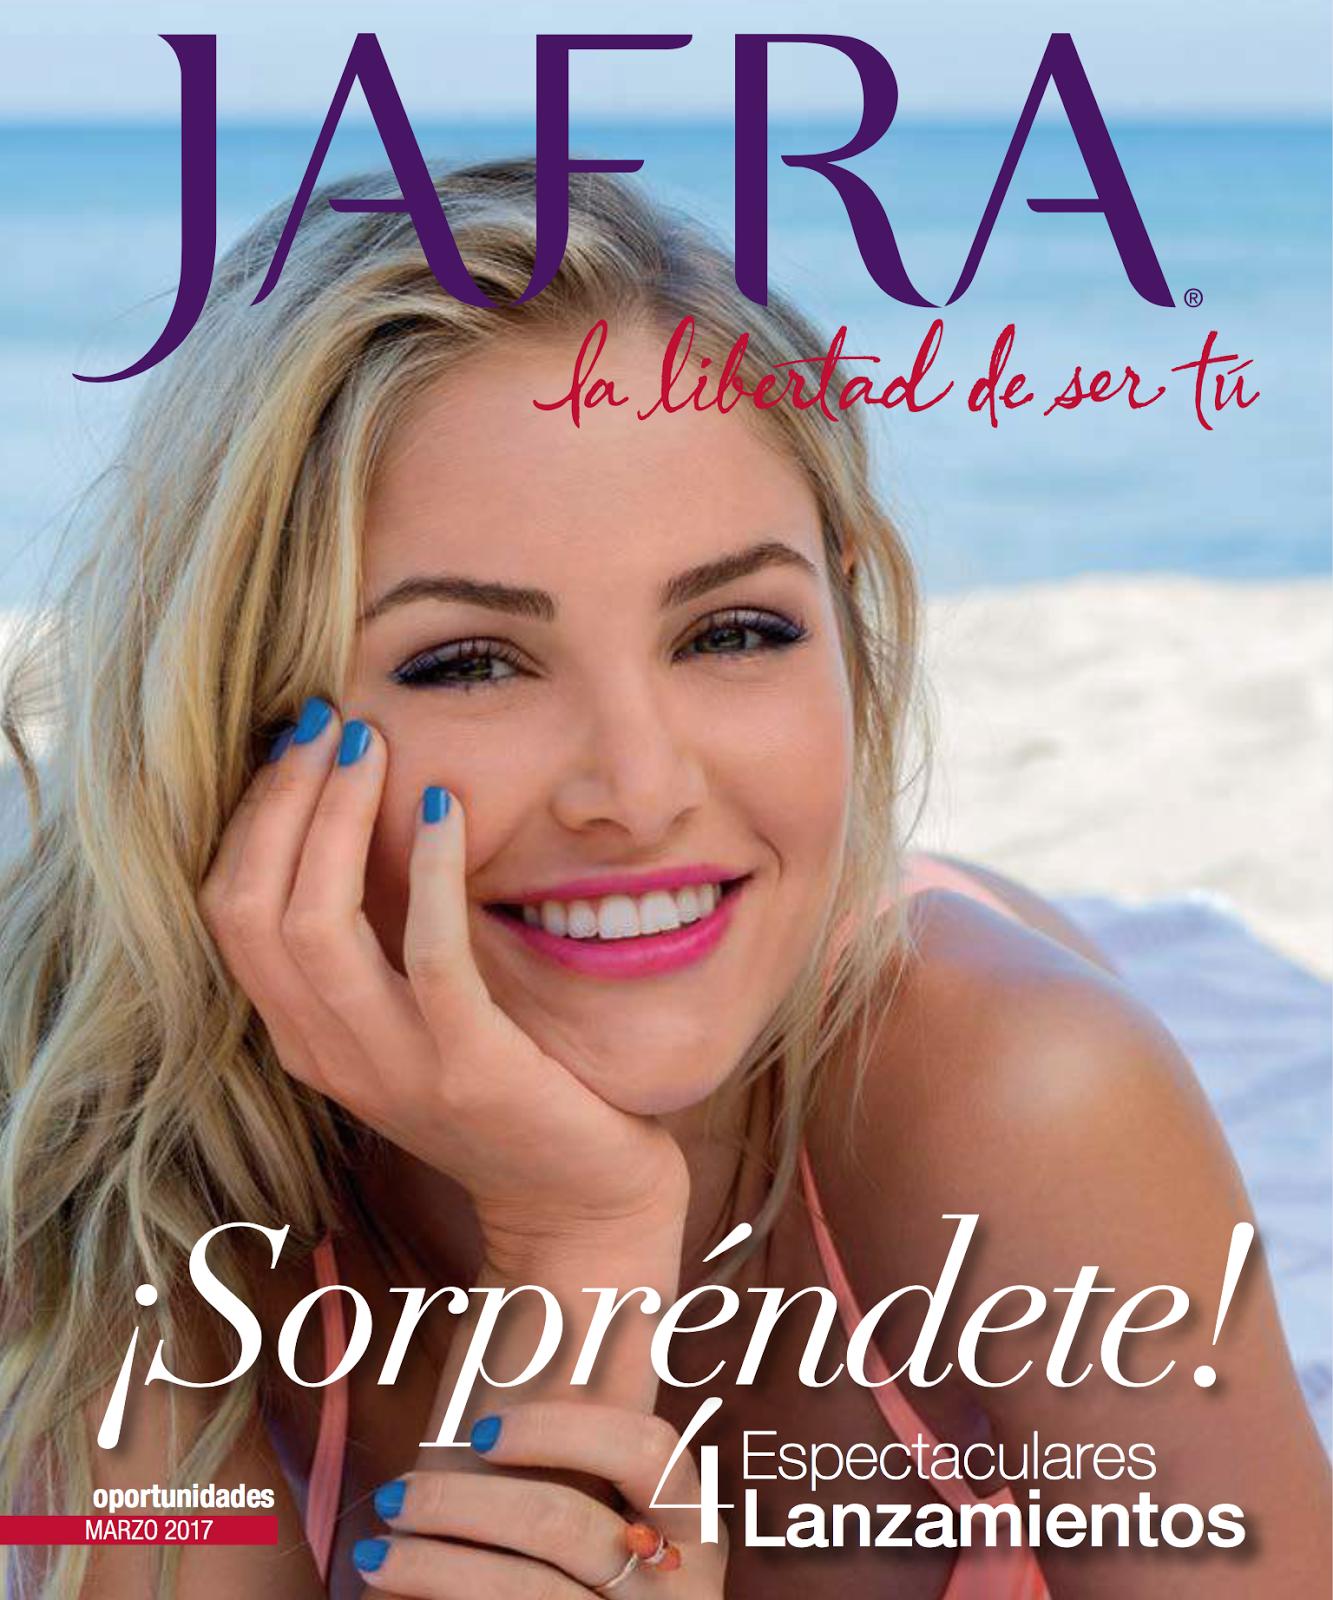 Jafra m xico folleto oportunidades nuevo folleto jafra for Catalogo bp 2017